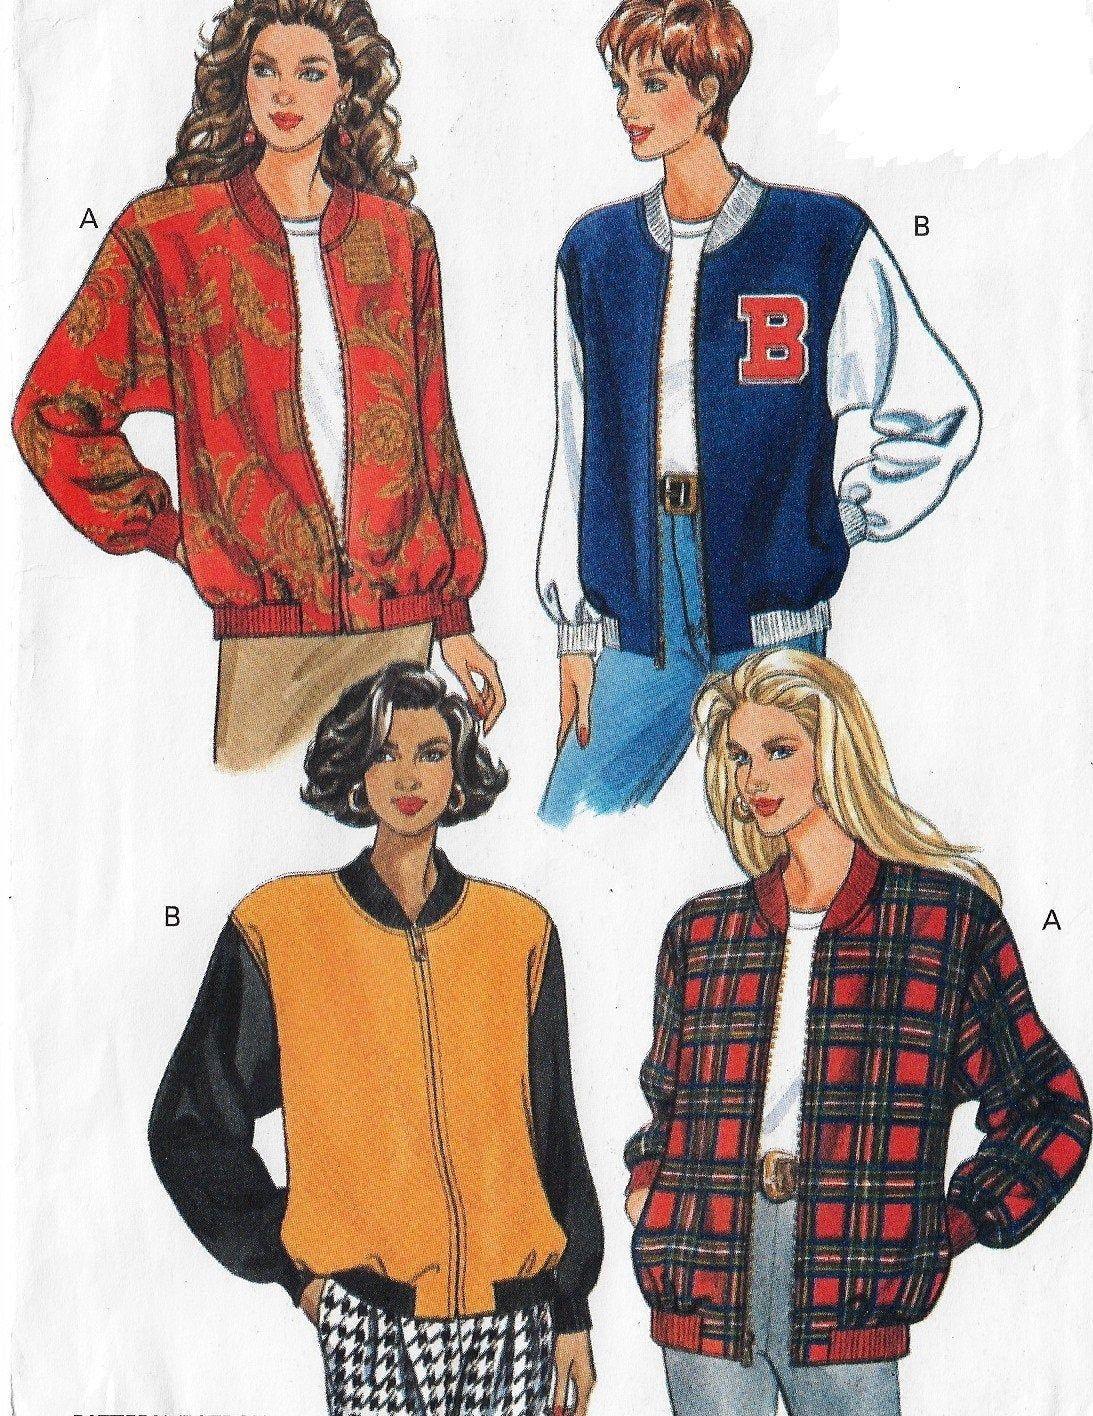 90s Butterick Sewing Pattern 6284 Womens Bomber Jacket Front Zipper Varsity Jacket Size 6 8 10 12 14 16 18 20 22 Bust 30 1 2 To 44 Ff Patterned Bomber Jacket Jacket Pattern Sewing Bomber Jacket Women [ 1416 x 1093 Pixel ]